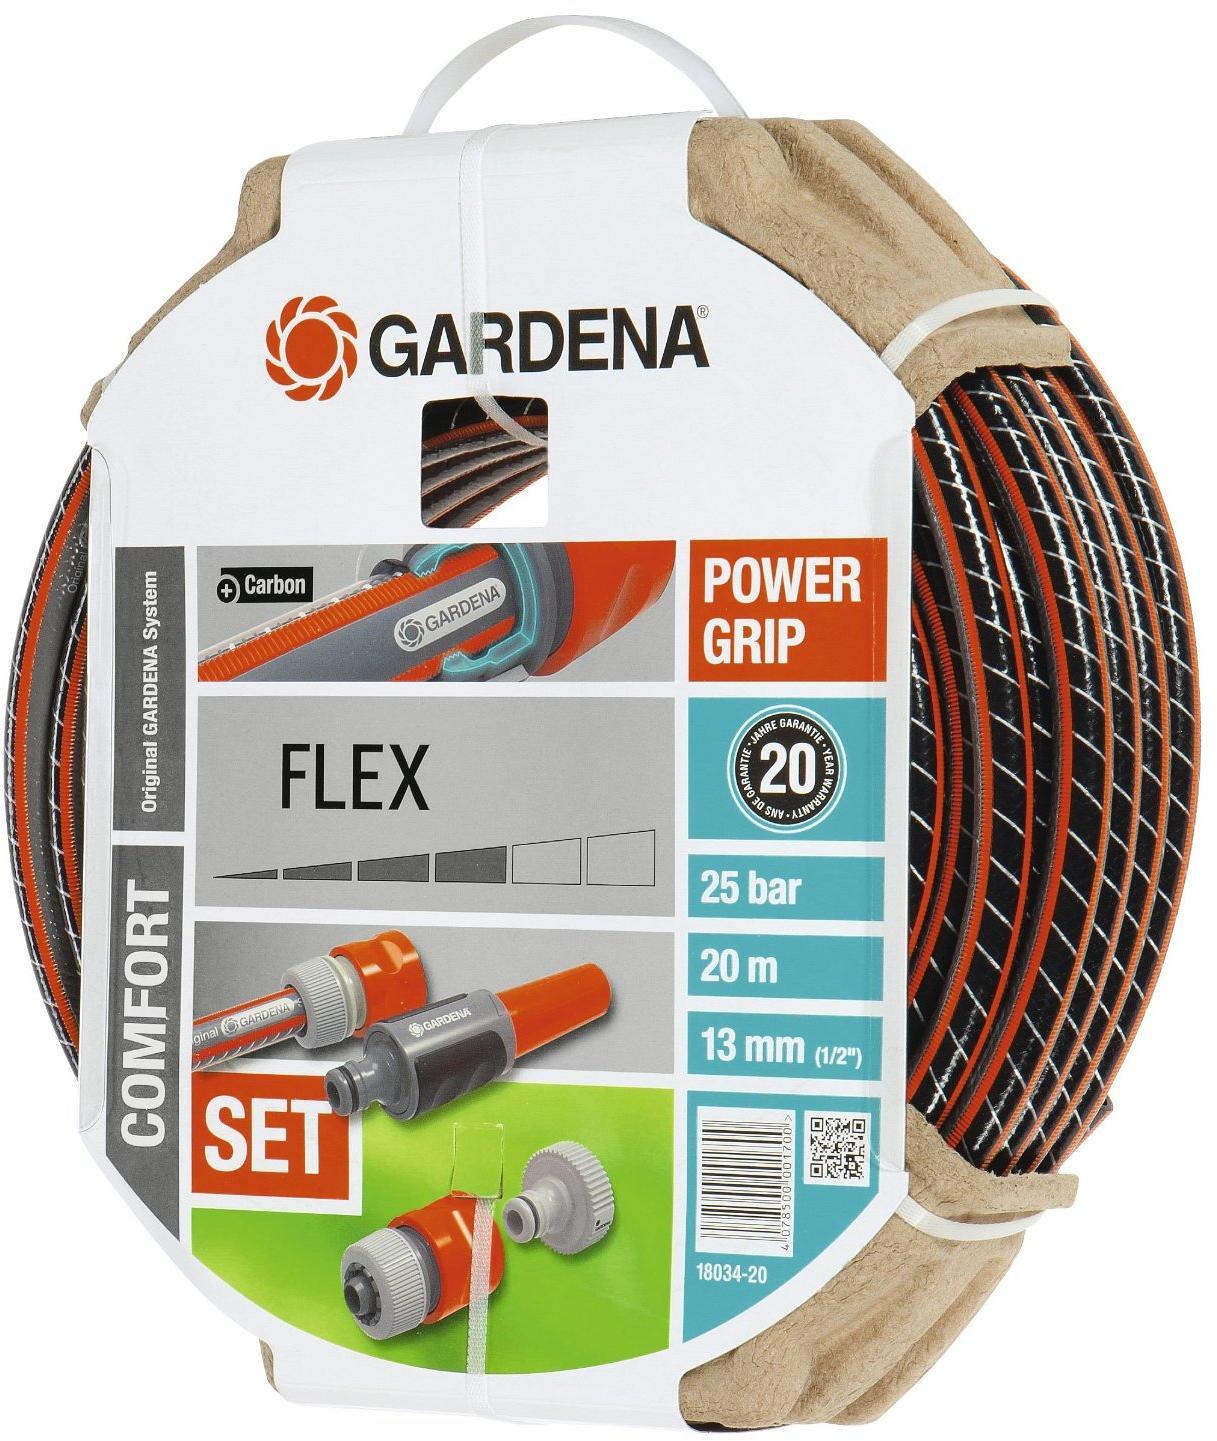 comfort flex schlauch 13 mm gardena 18034 20 1 2 20m. Black Bedroom Furniture Sets. Home Design Ideas